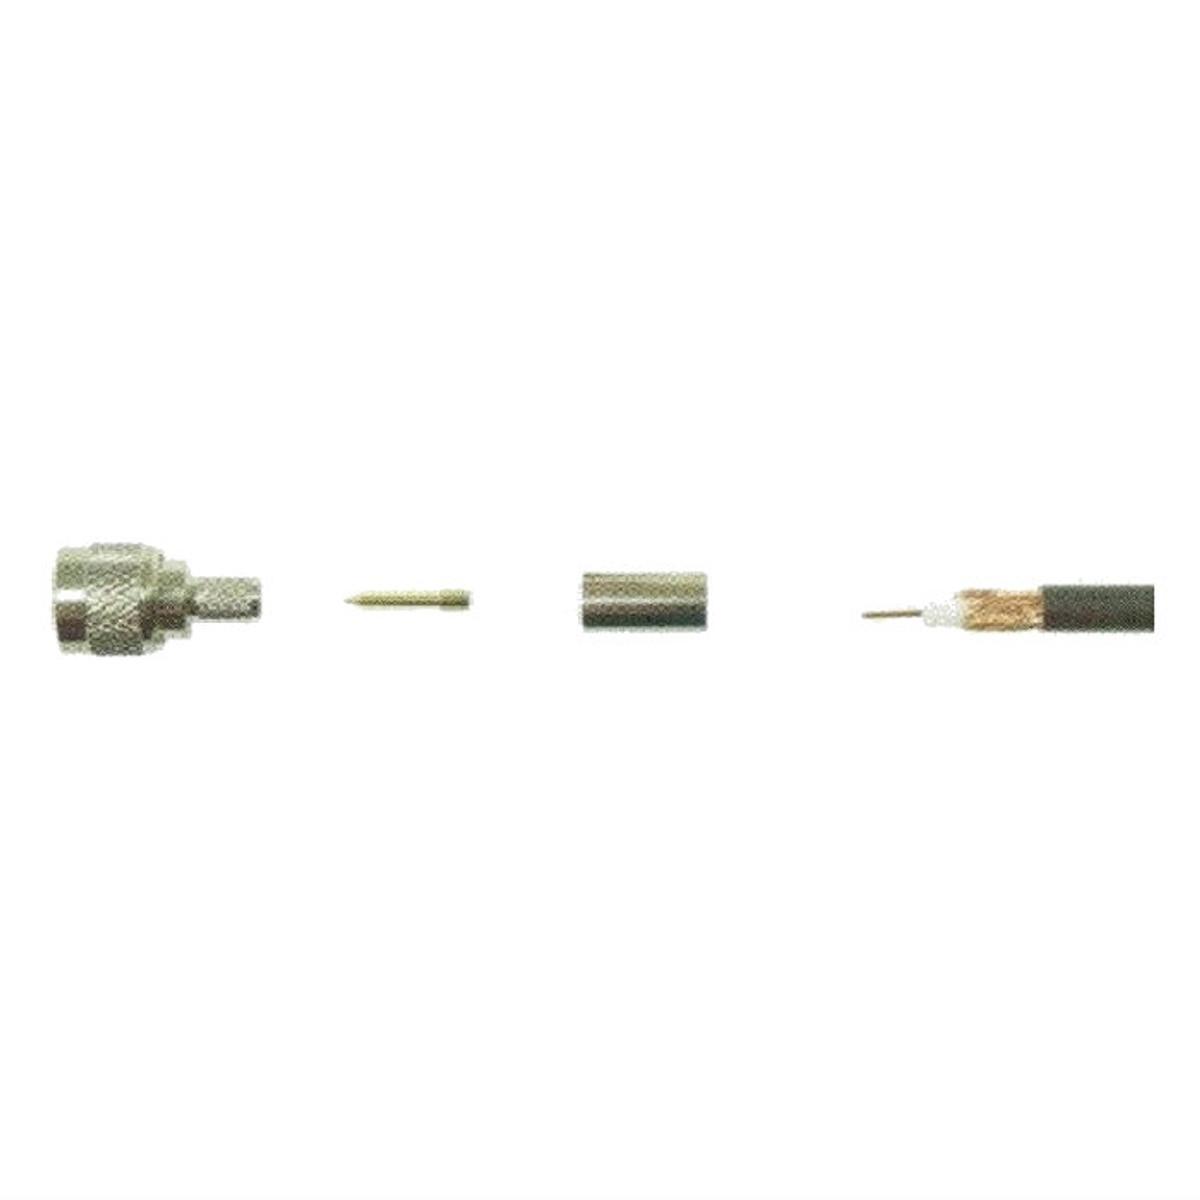 Wilson 971112 Mini UHF Male Crimp for RG 58U Cable